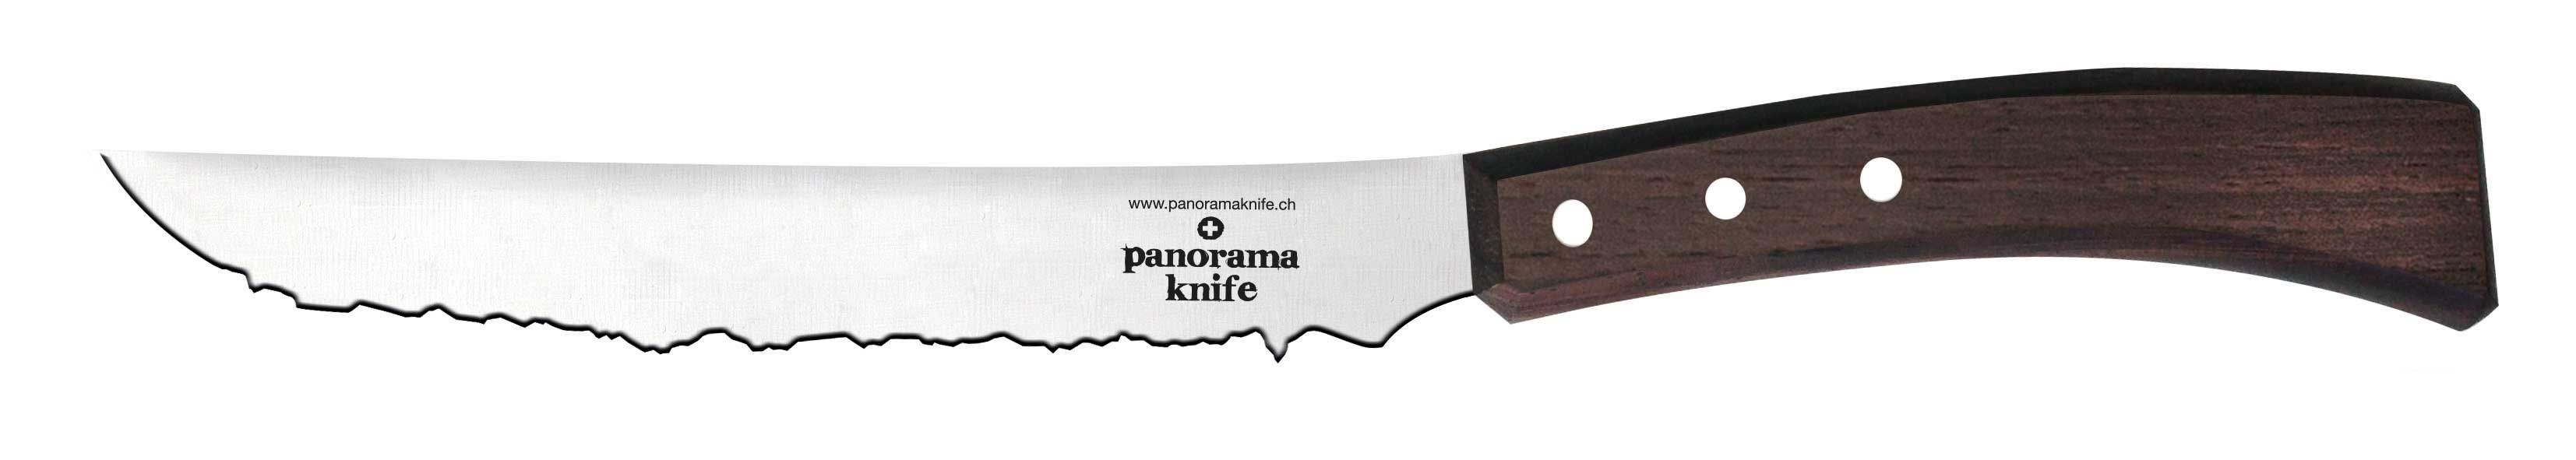 PanoramaKnife Universalmesser Wallis Rückseite